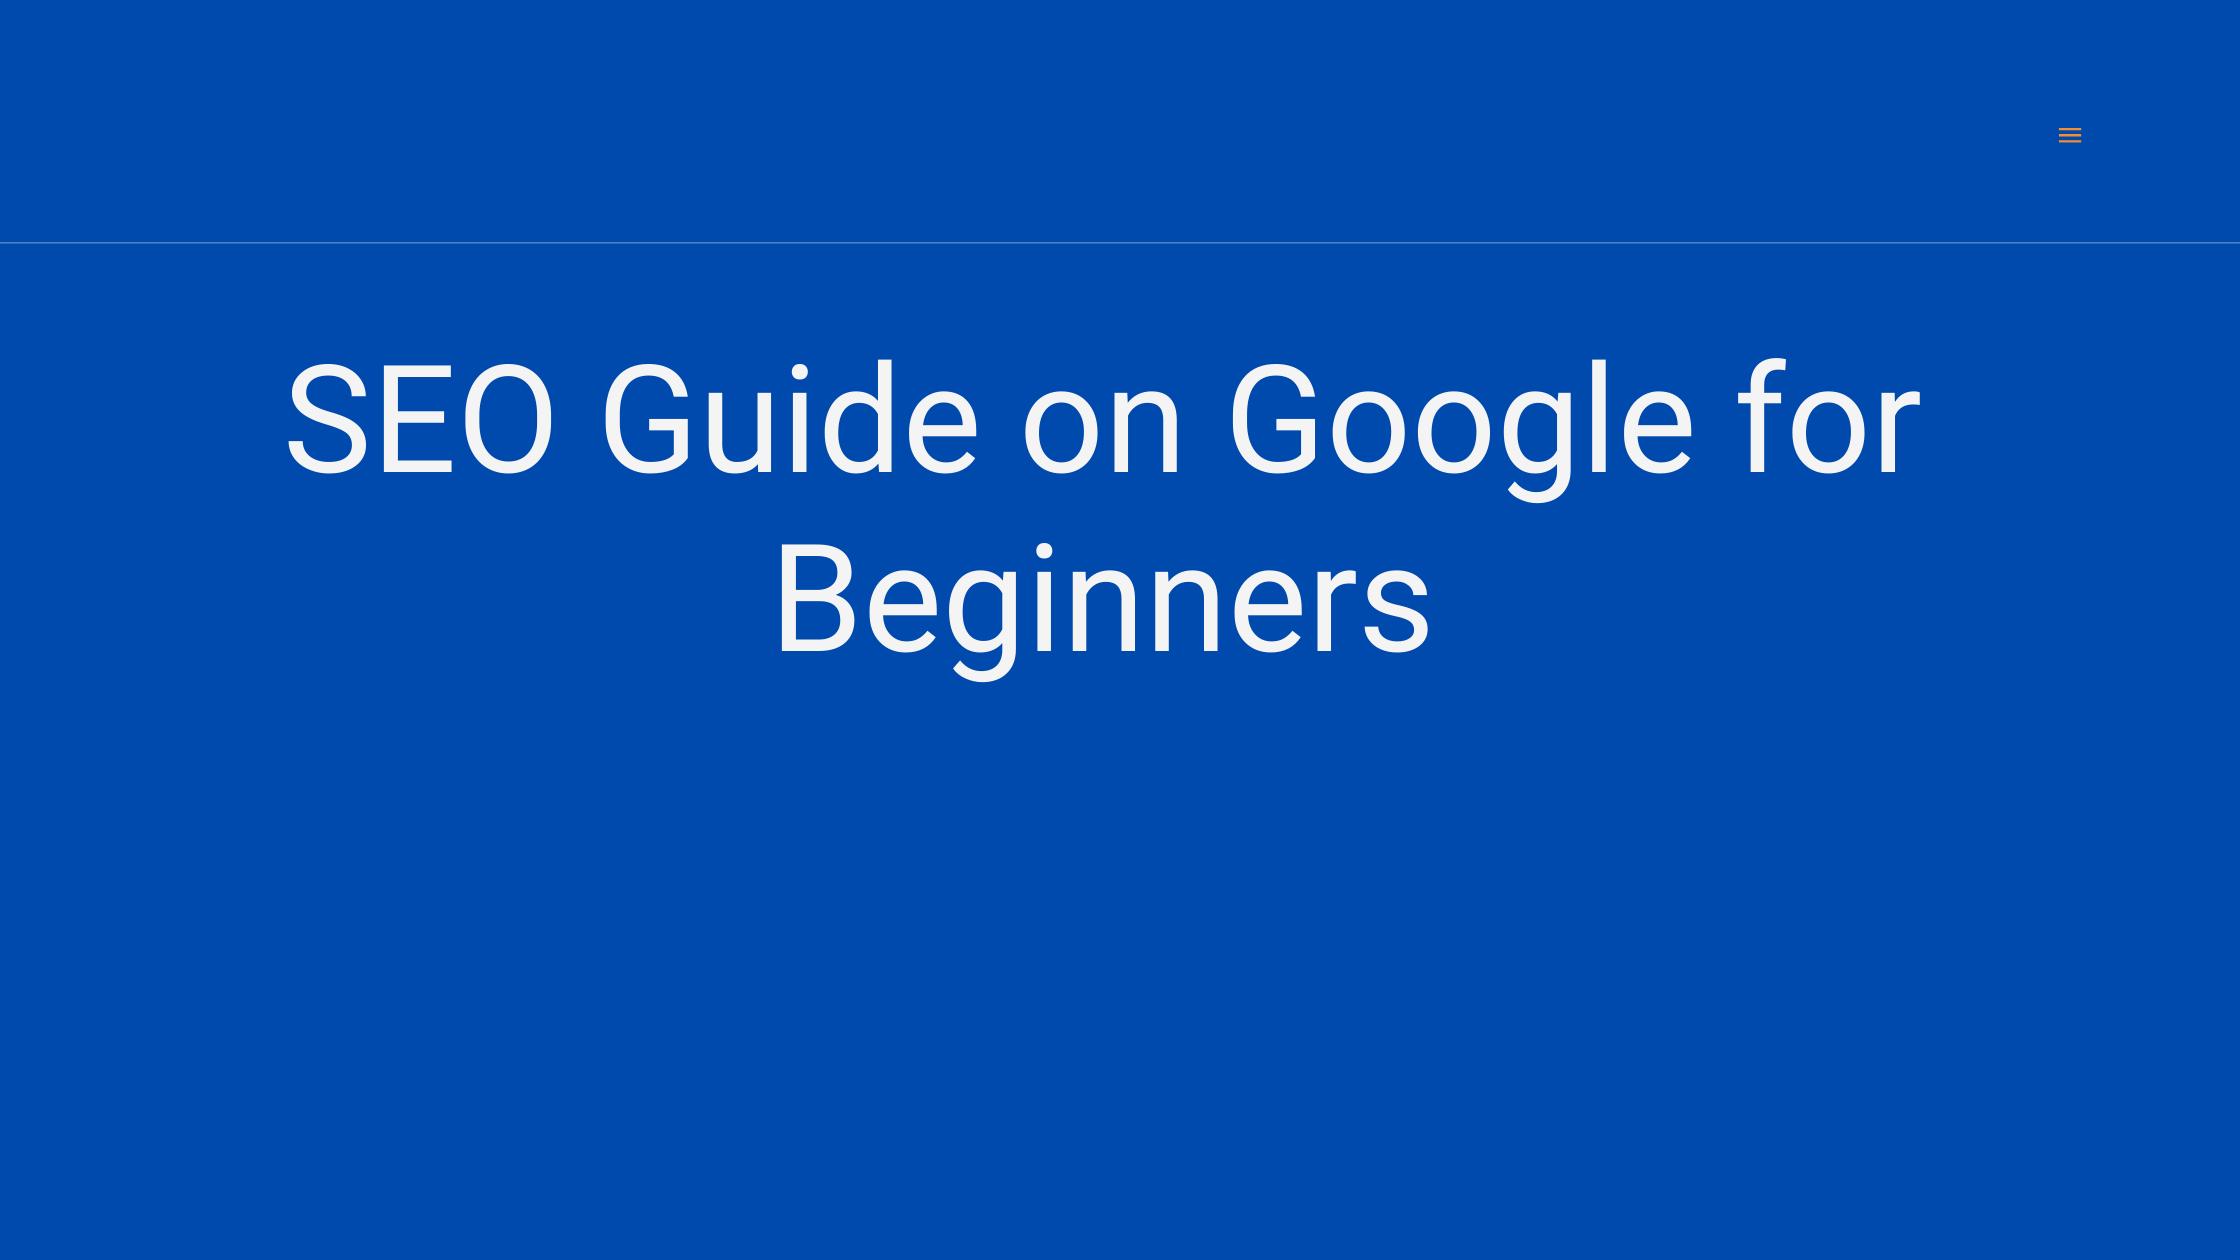 Seo guide on google for beginners